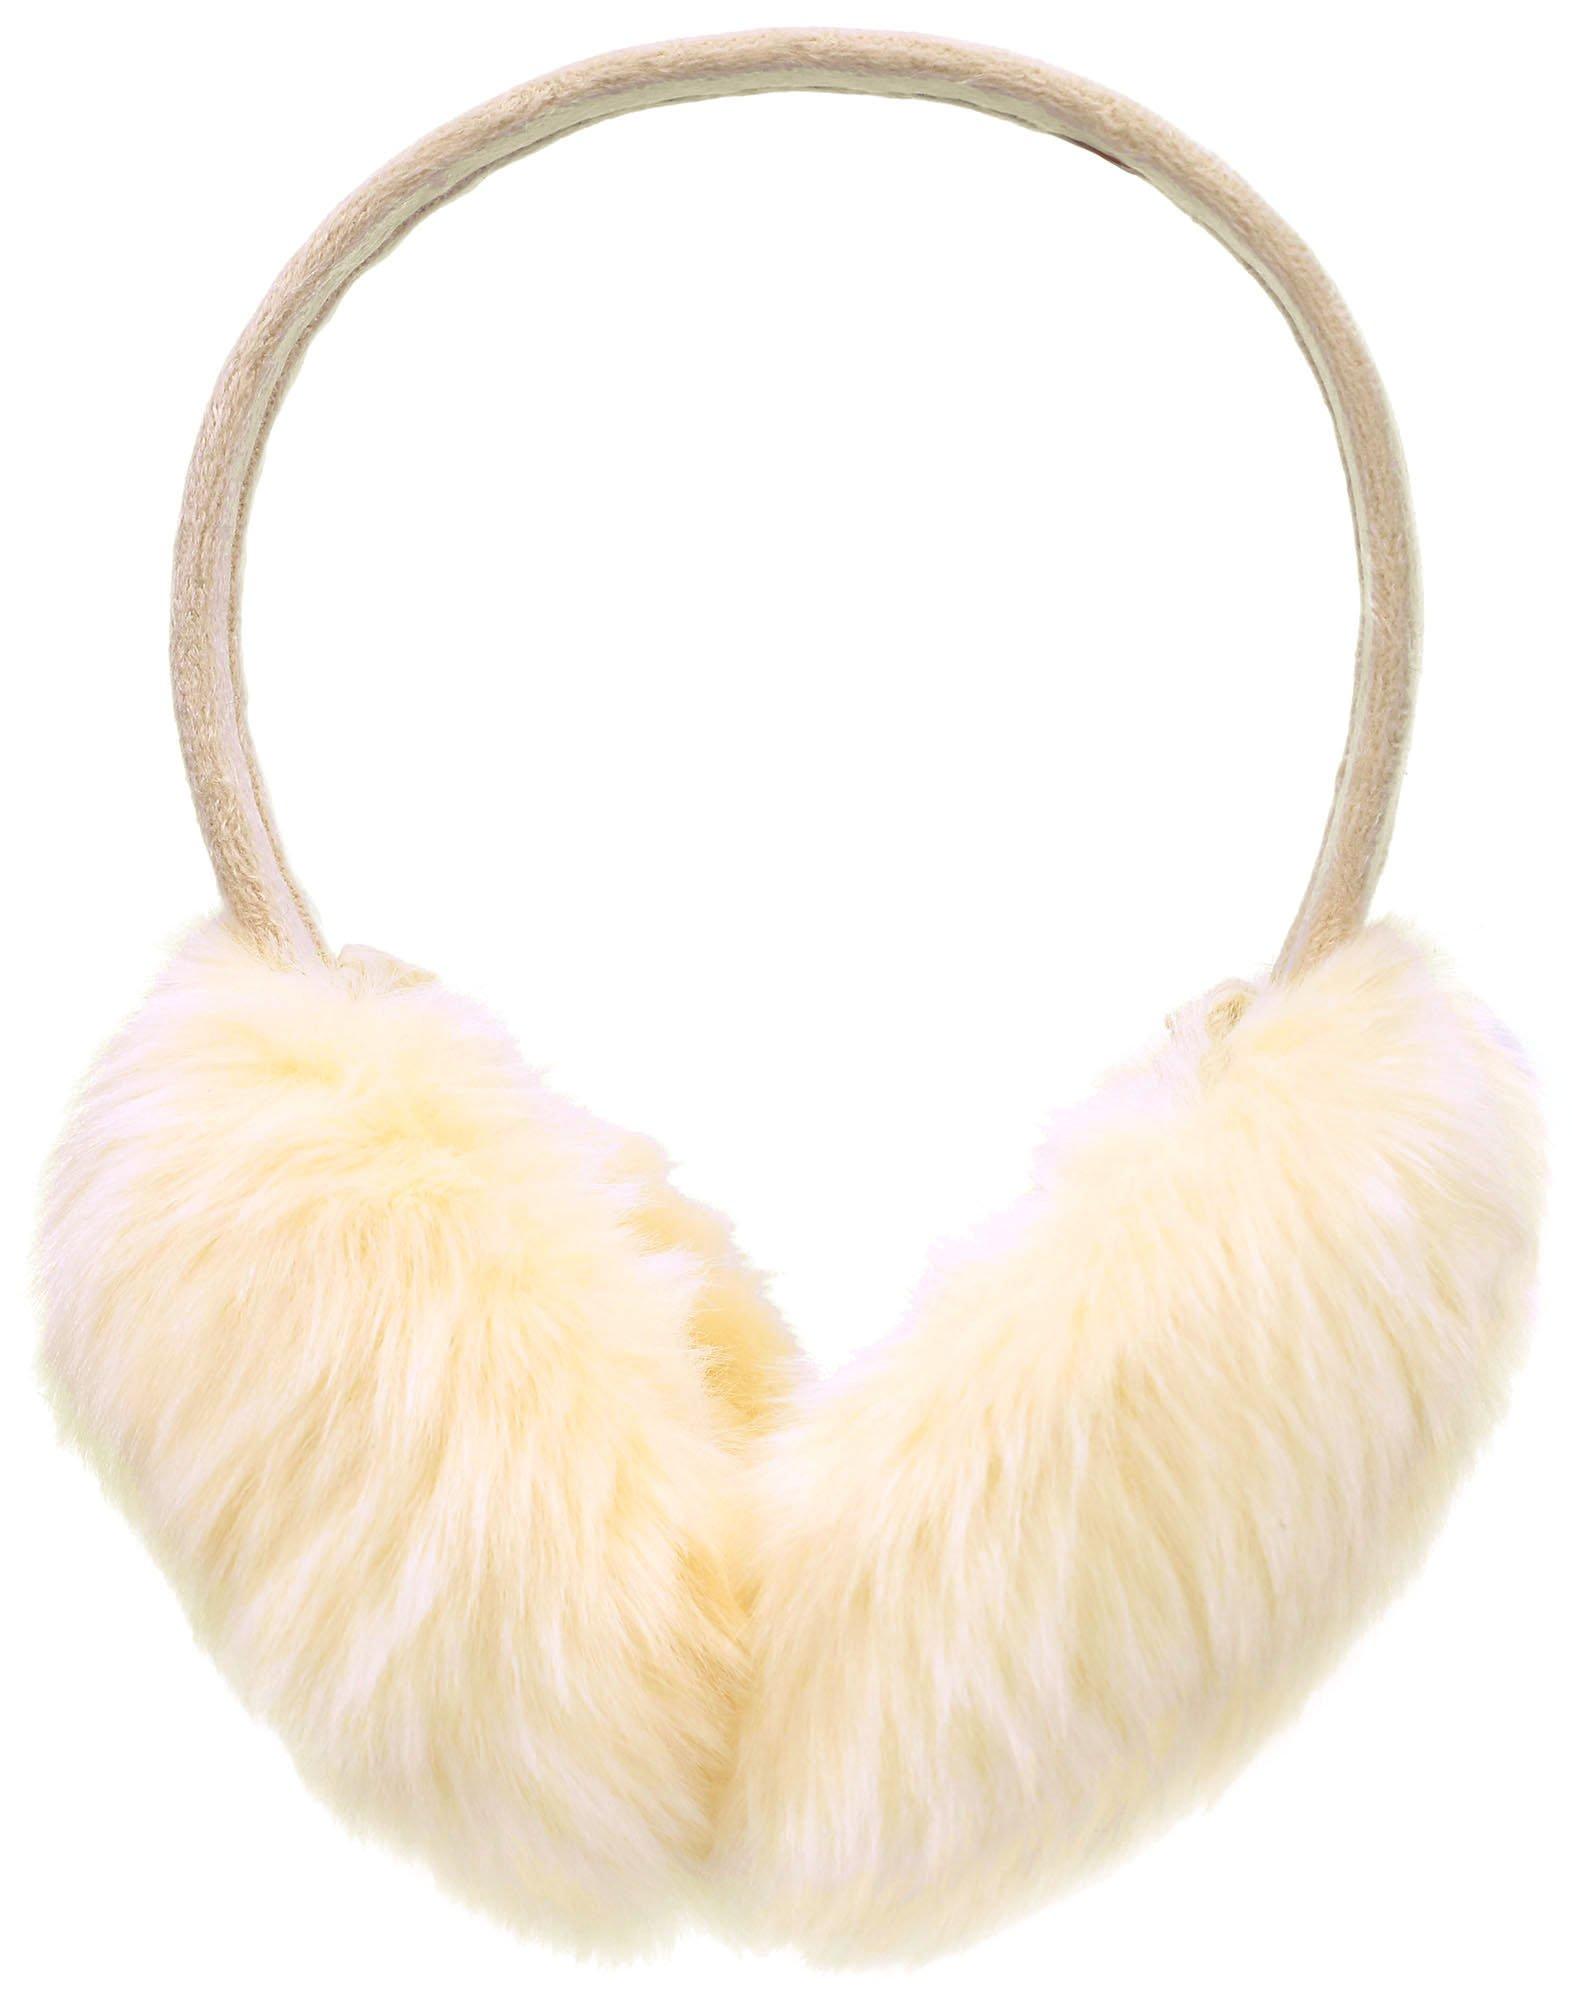 Women Women's Colorful Faux-Fur Furry Winter Earmuffs Ear Warmers, Cream